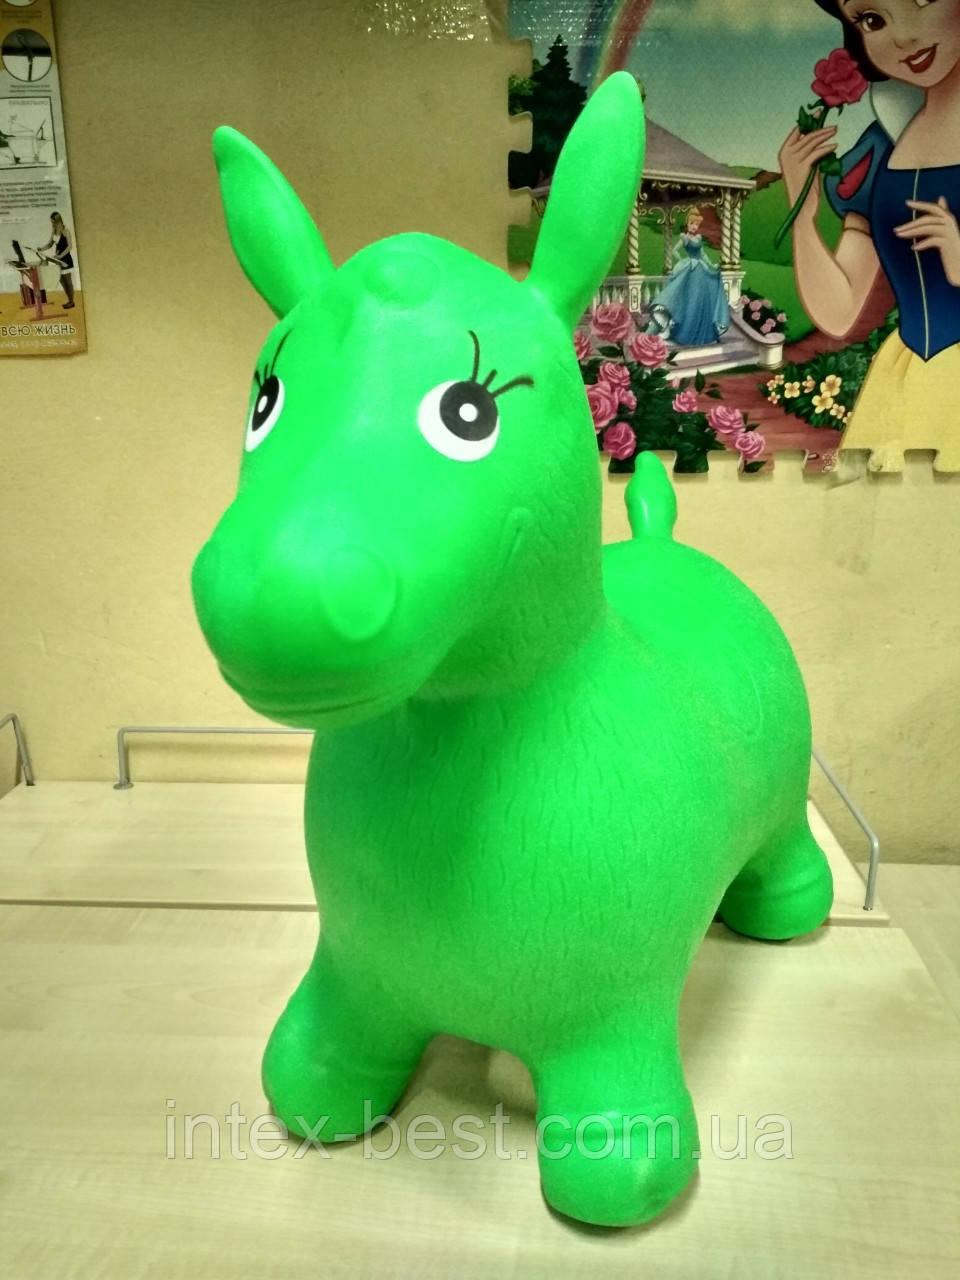 Прыгун-лошадка MS 0001 (Зеленый)